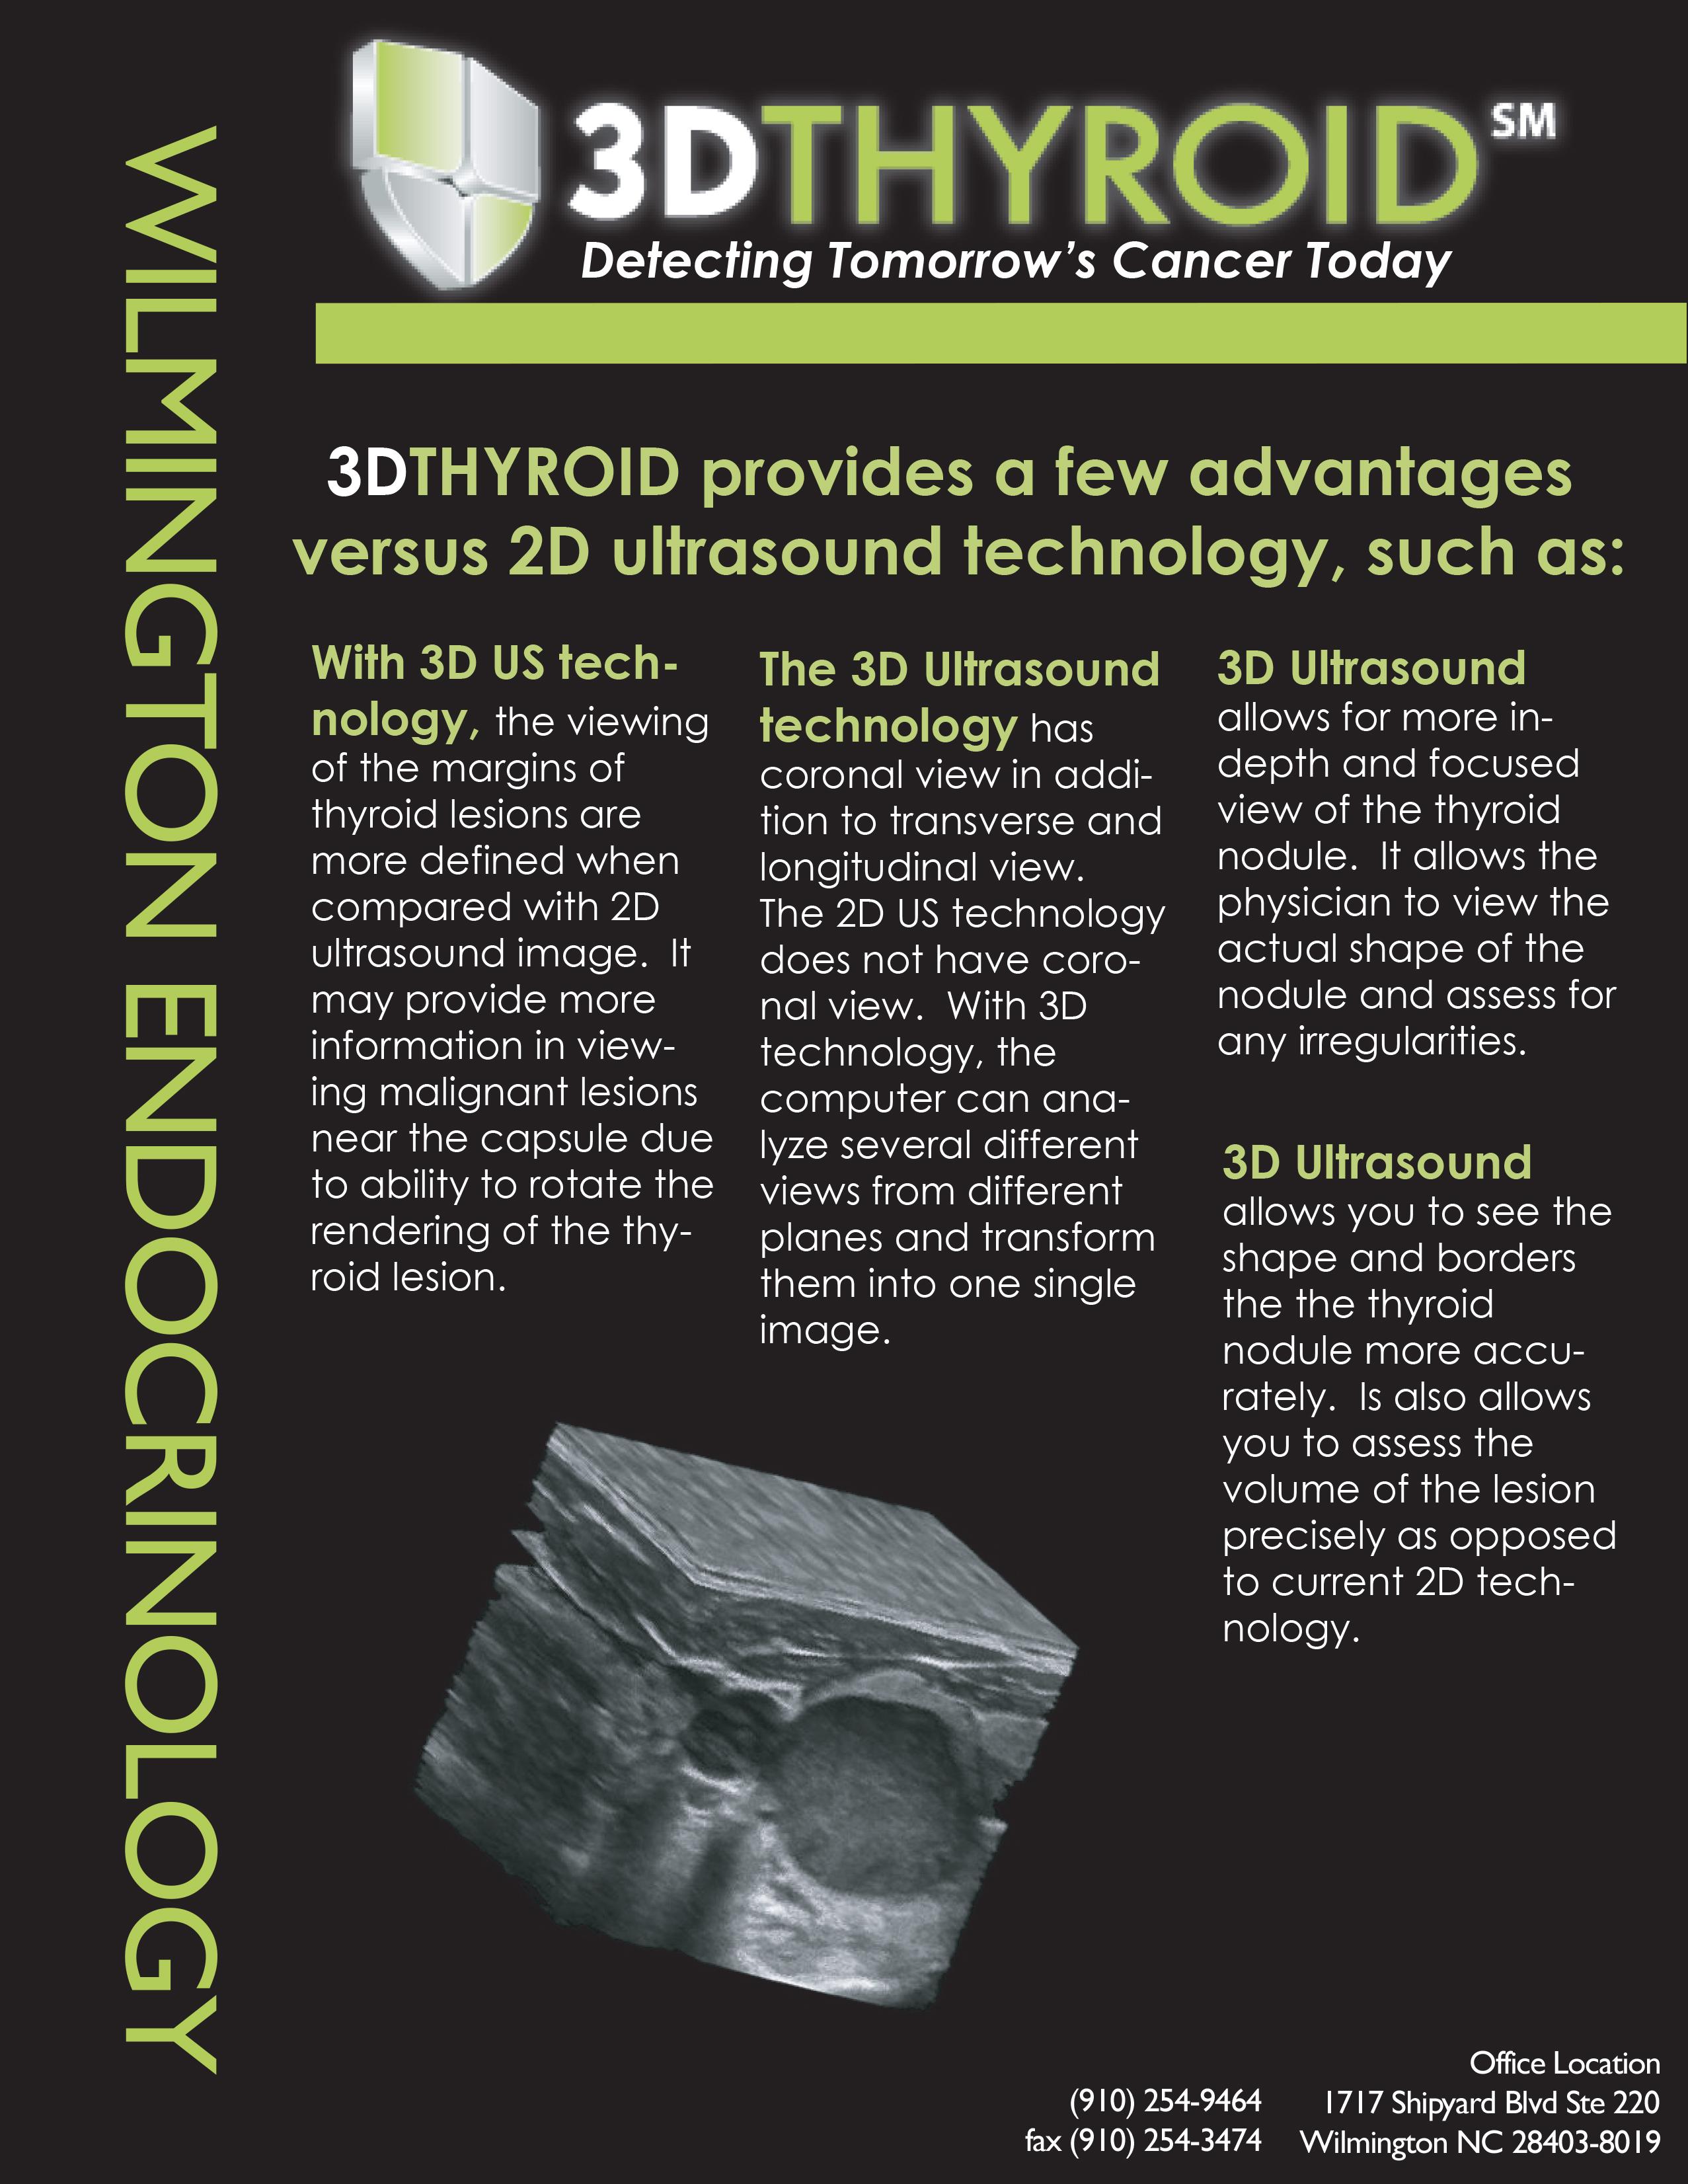 Azizi 3D Thyroid Brochure 3